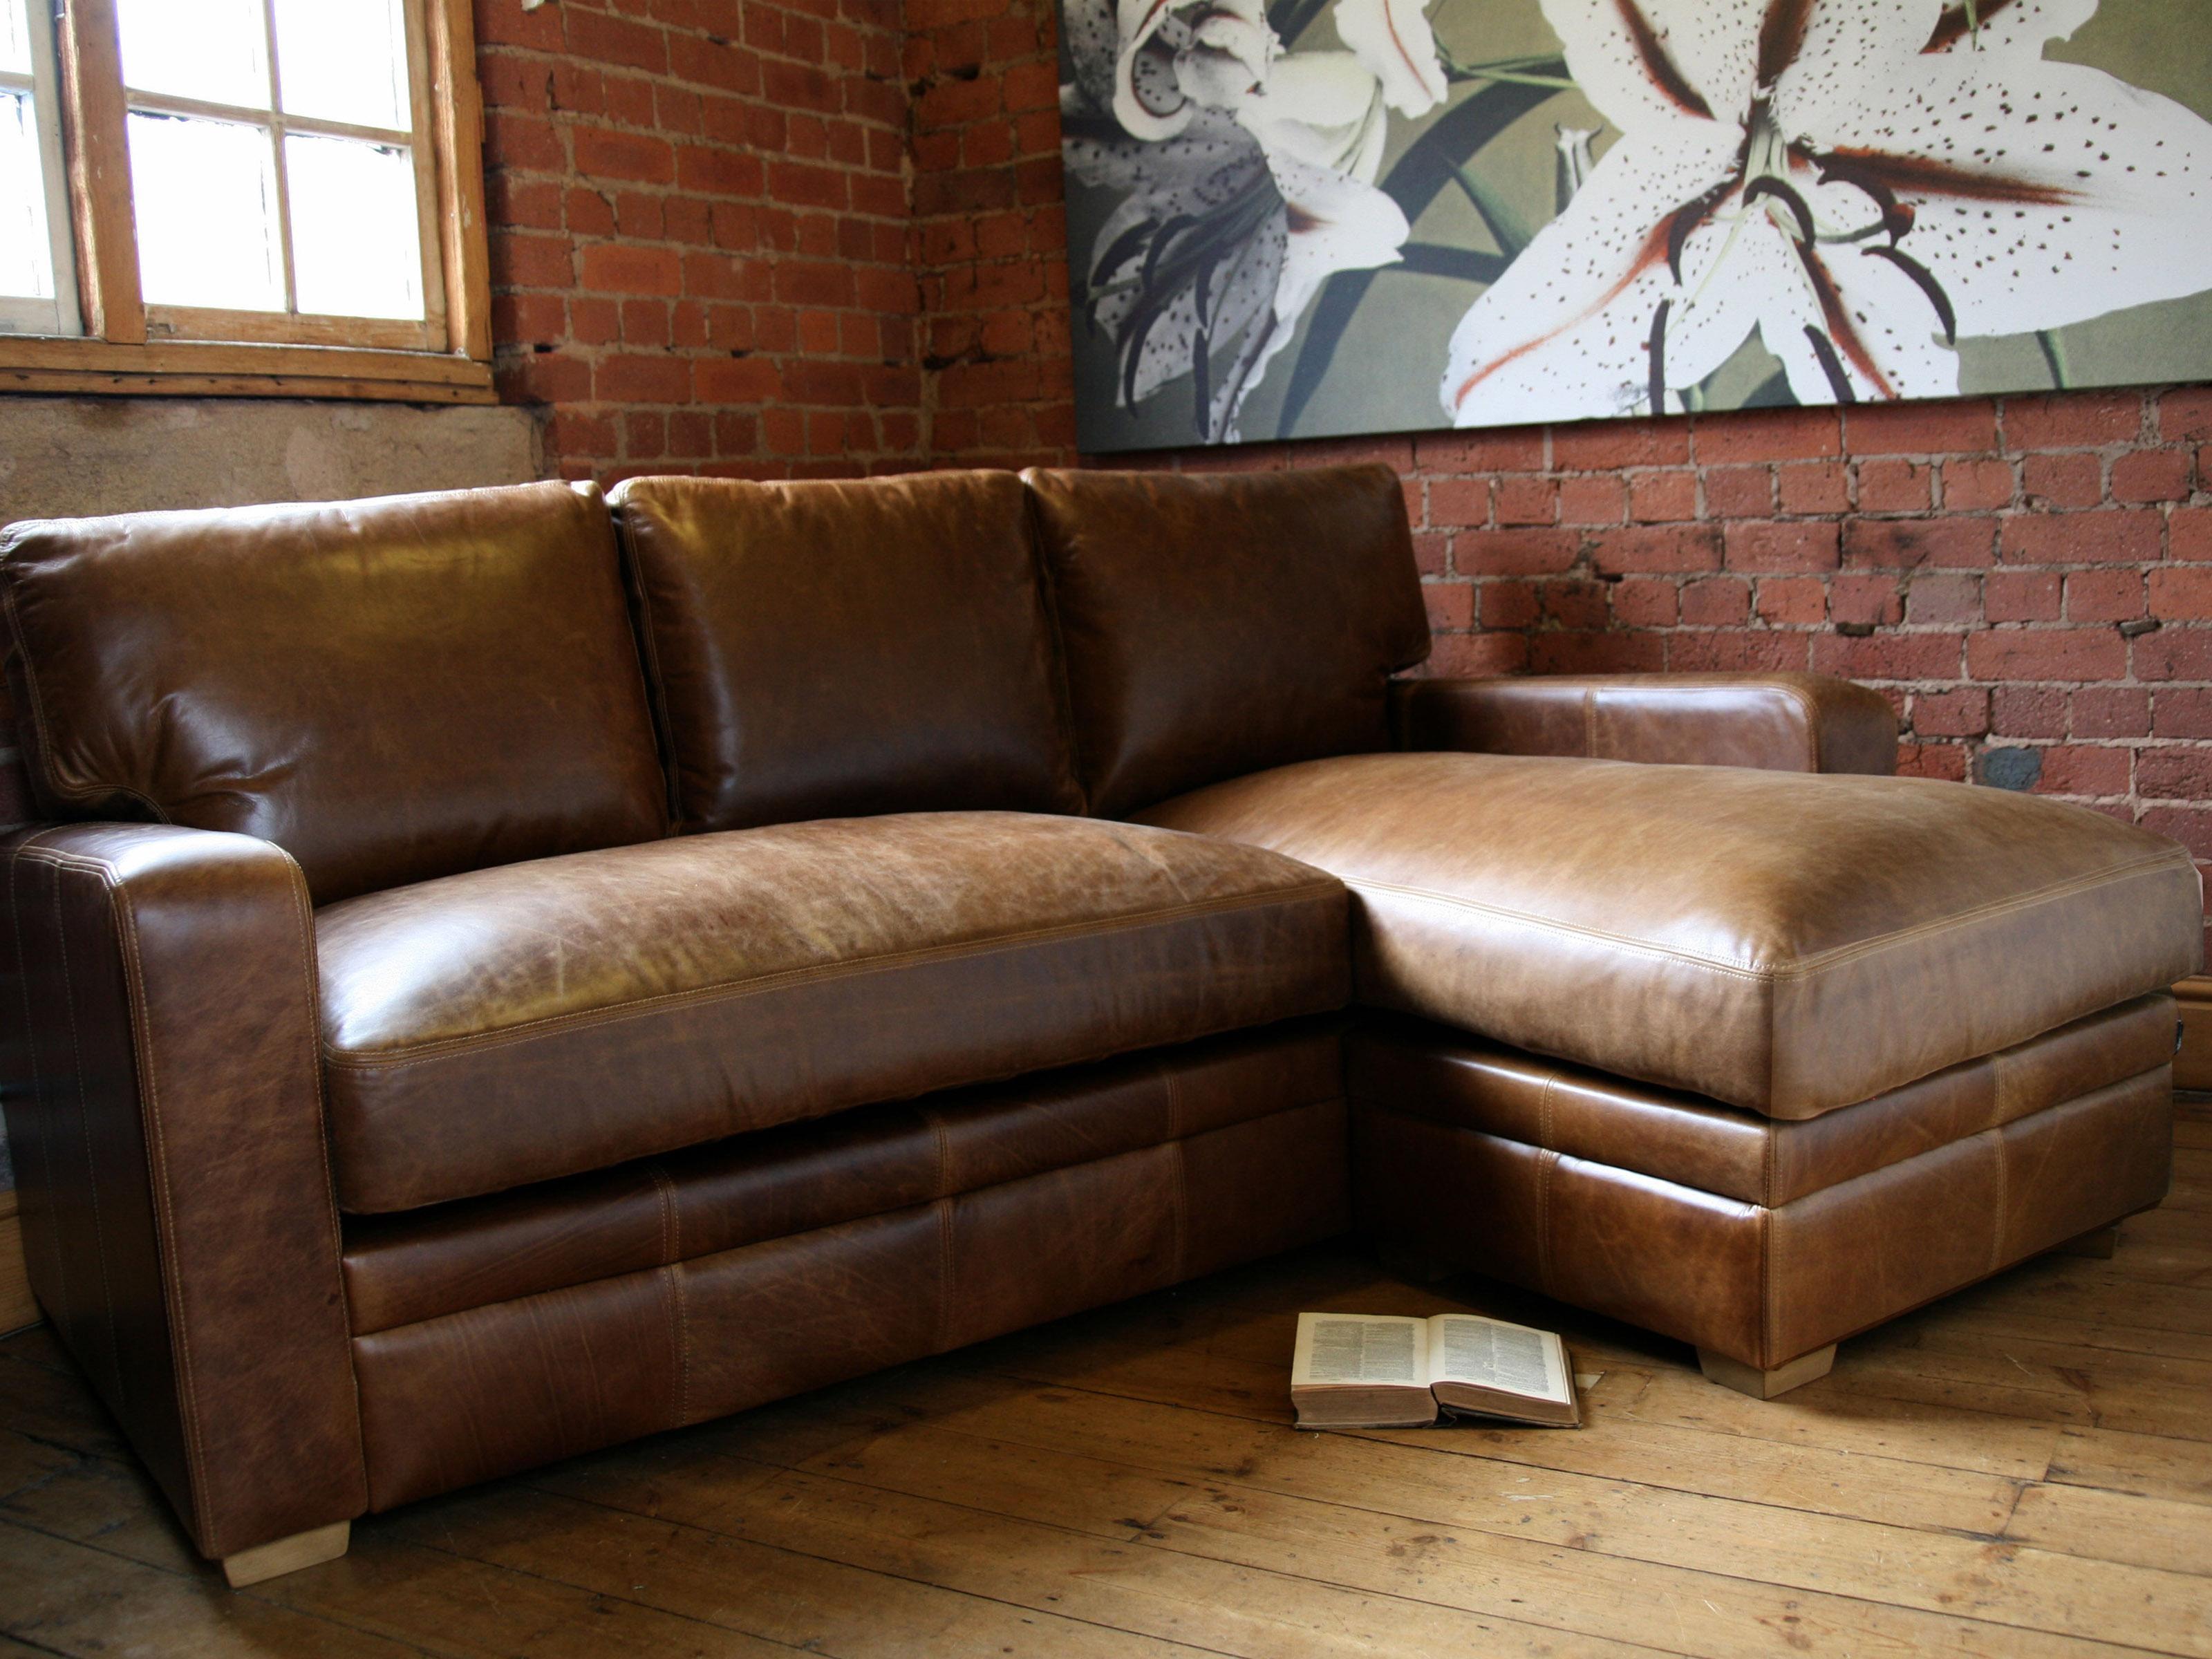 Sofas Center : Crate And Barrel Leather Davis Sofacrate Sleeper Regarding Davis Sofas (Image 17 of 20)